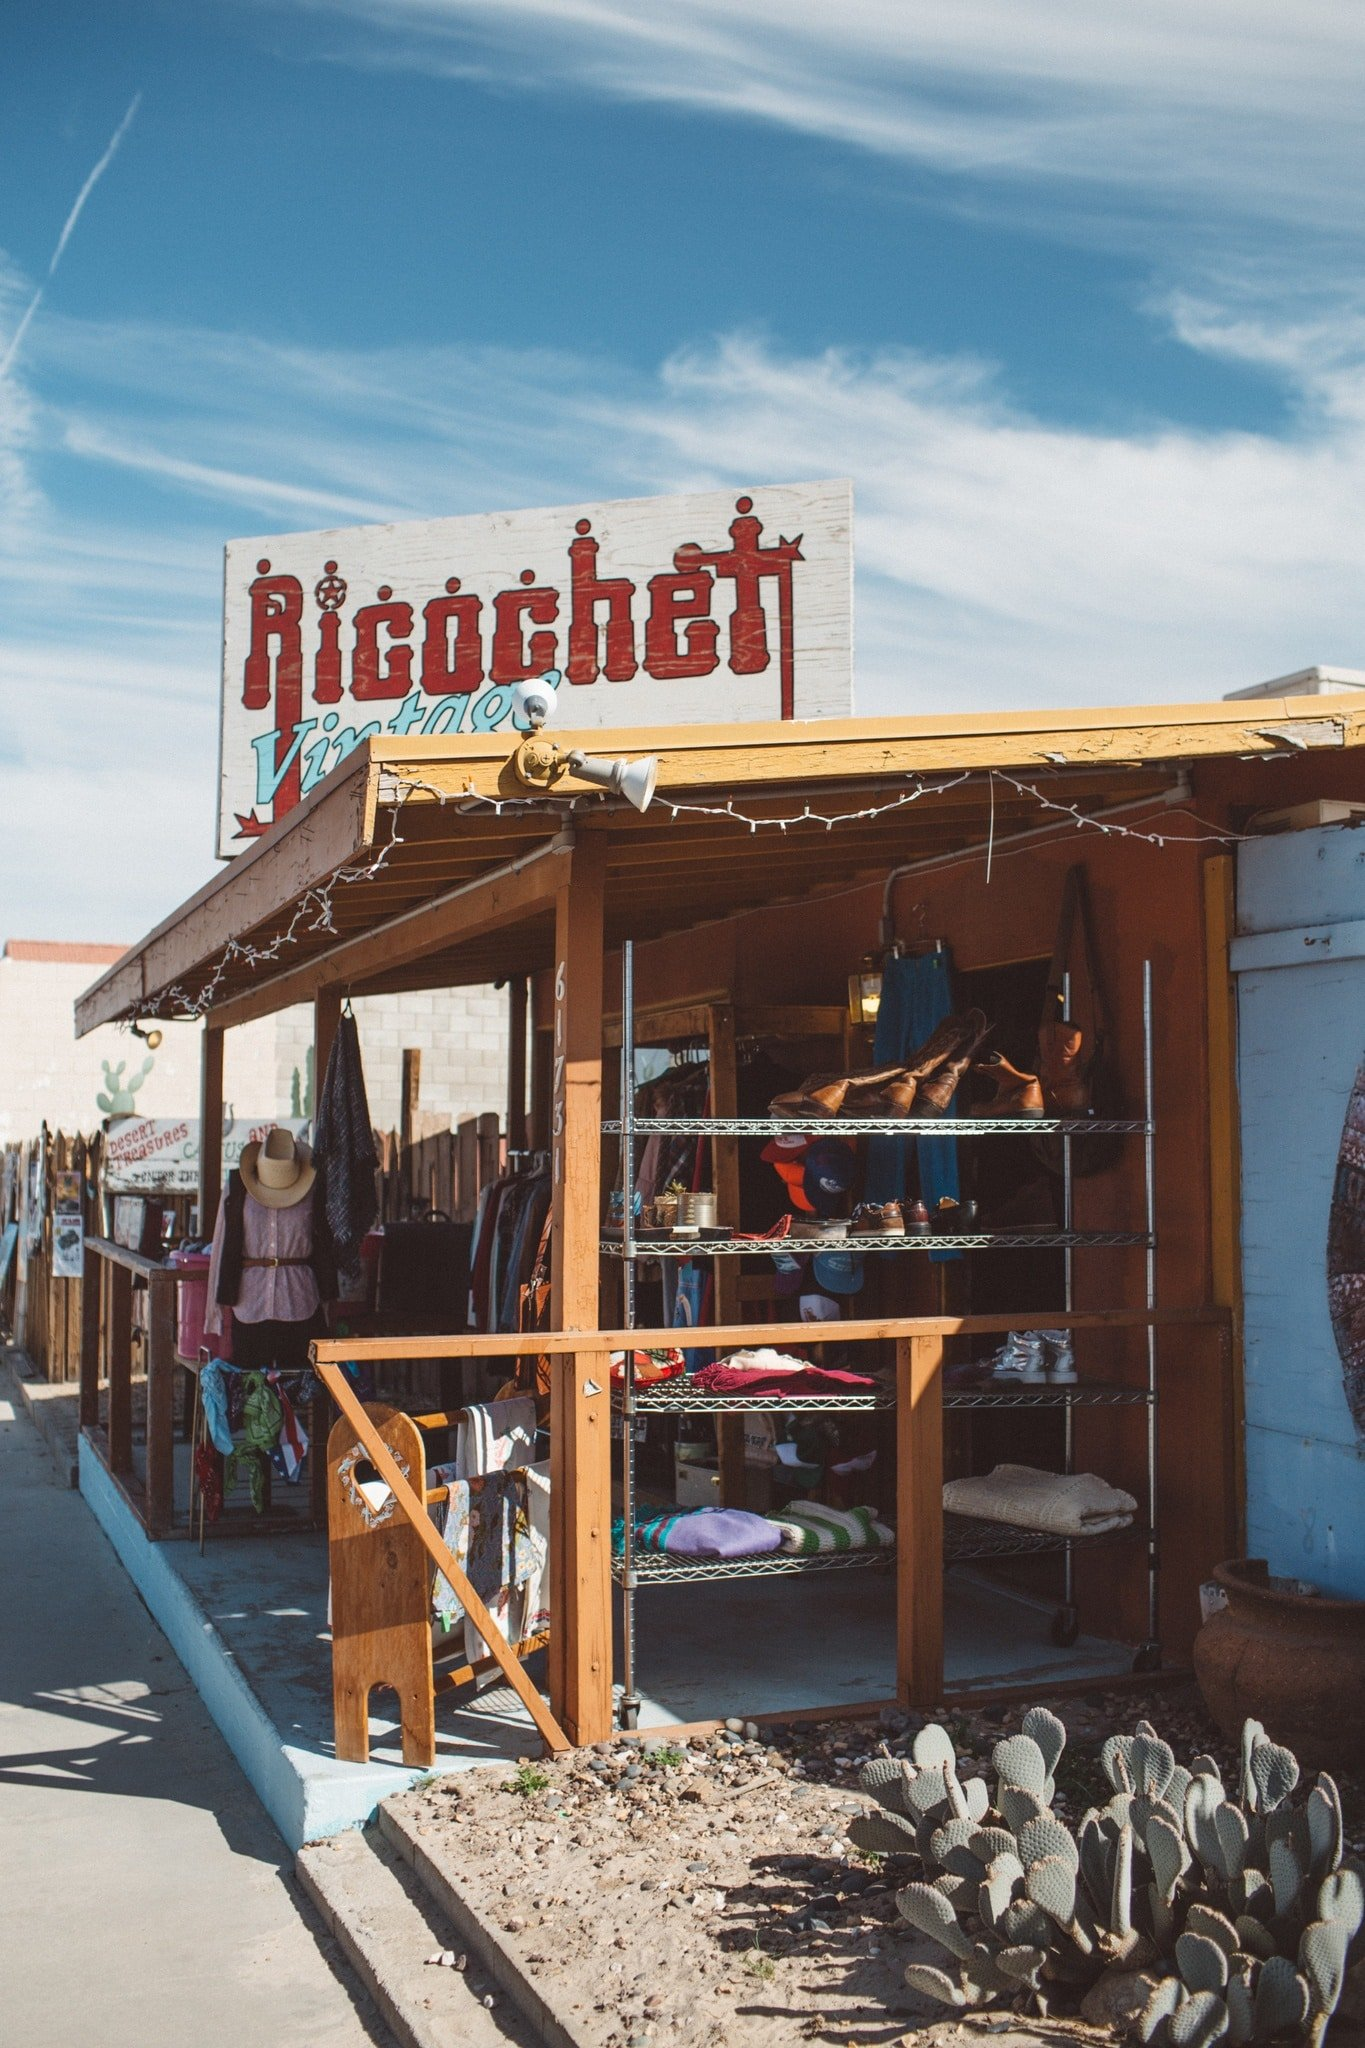 Small business in beautiful Joshua Tree California